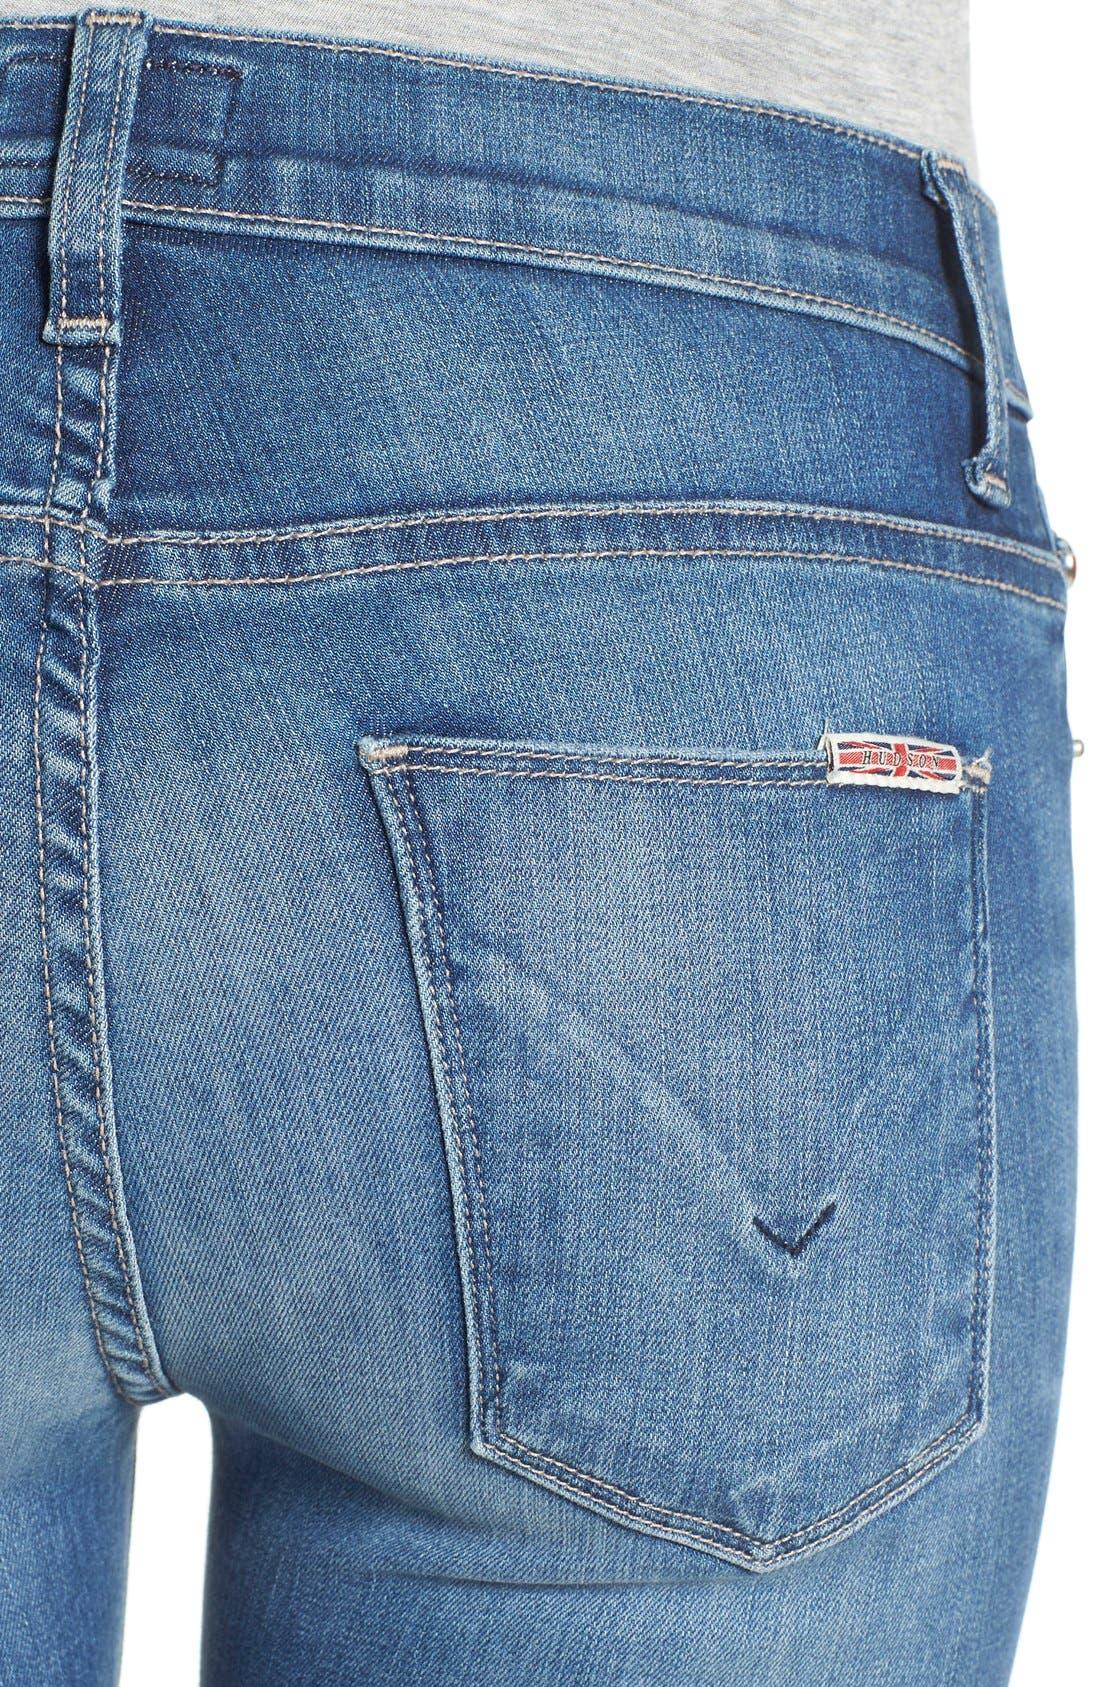 Alternate Image 4  - Hudson Jeans 'Nico' Super Skinny Jeans